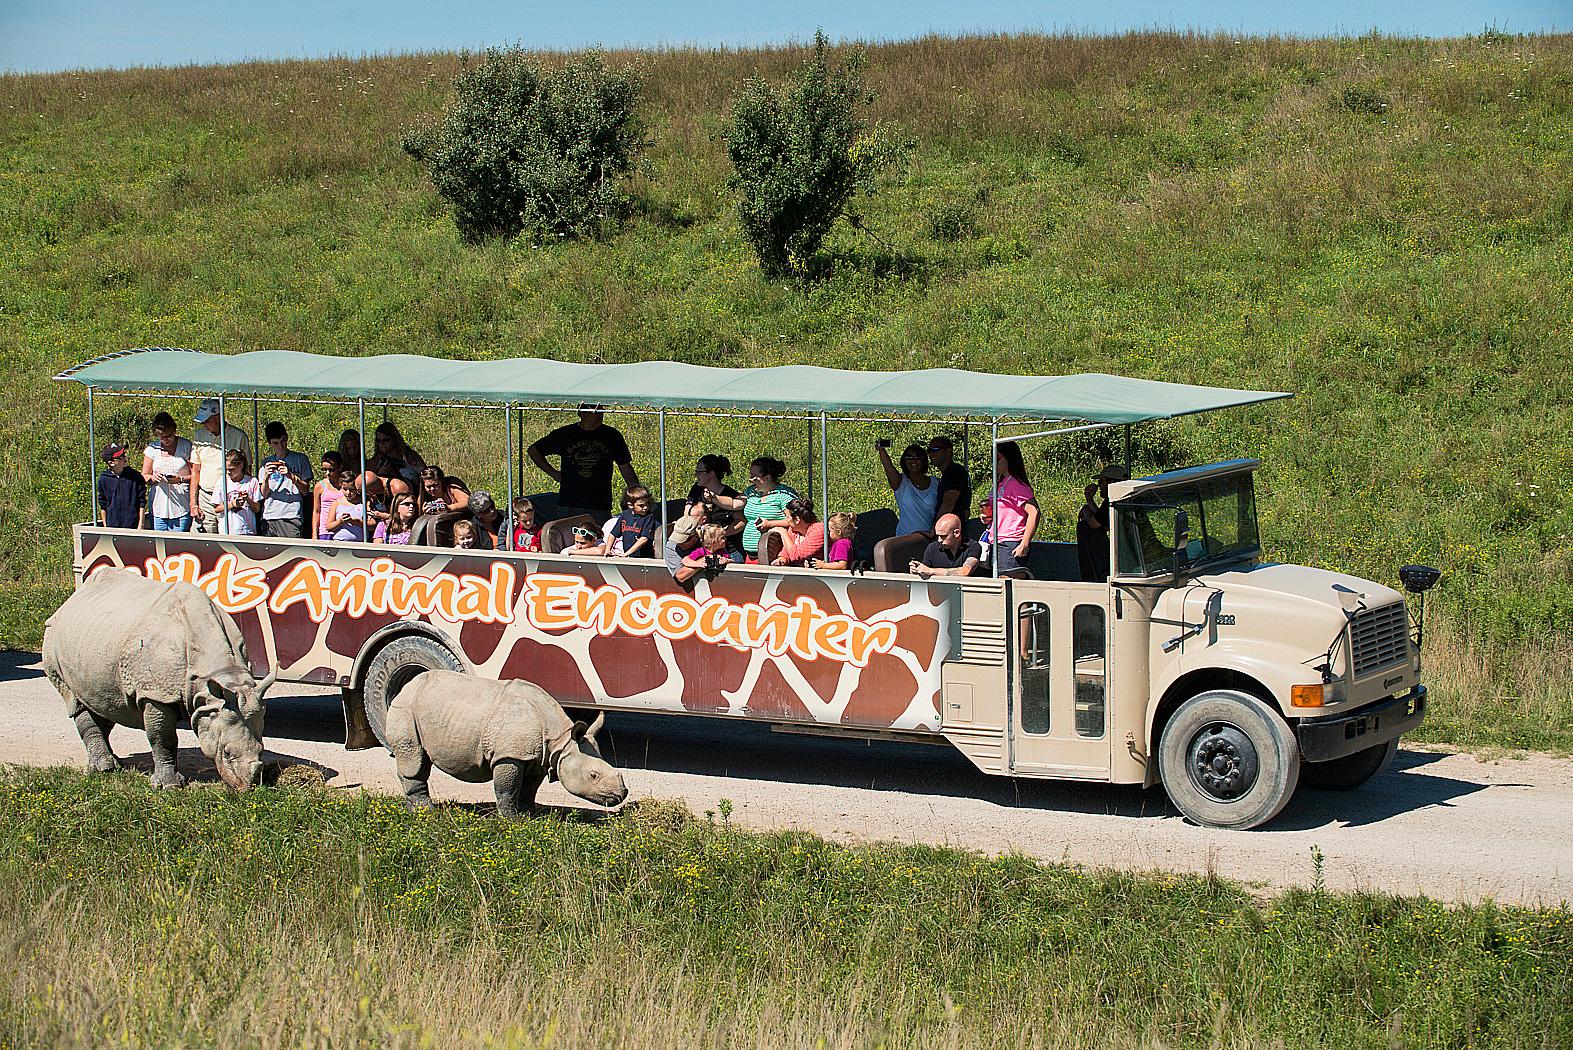 Open-Air Safari Tour at The Wilds